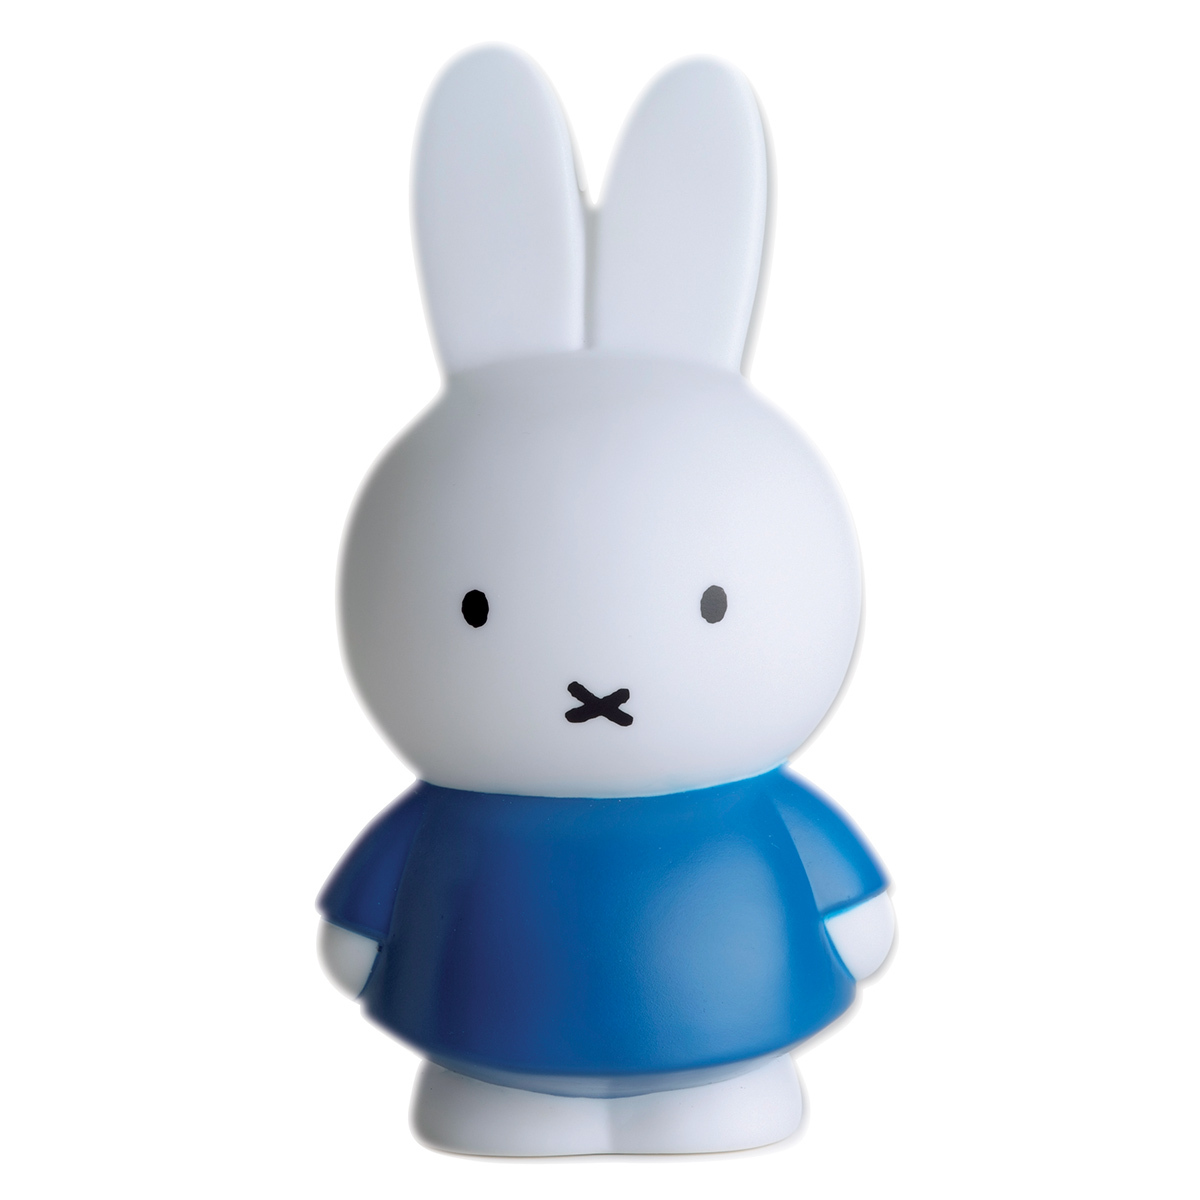 Tirelire Tirelire Miffy Taille Modèle Moyen - Bleu Tirelire Miffy Taille Modèle Moyen - Bleu